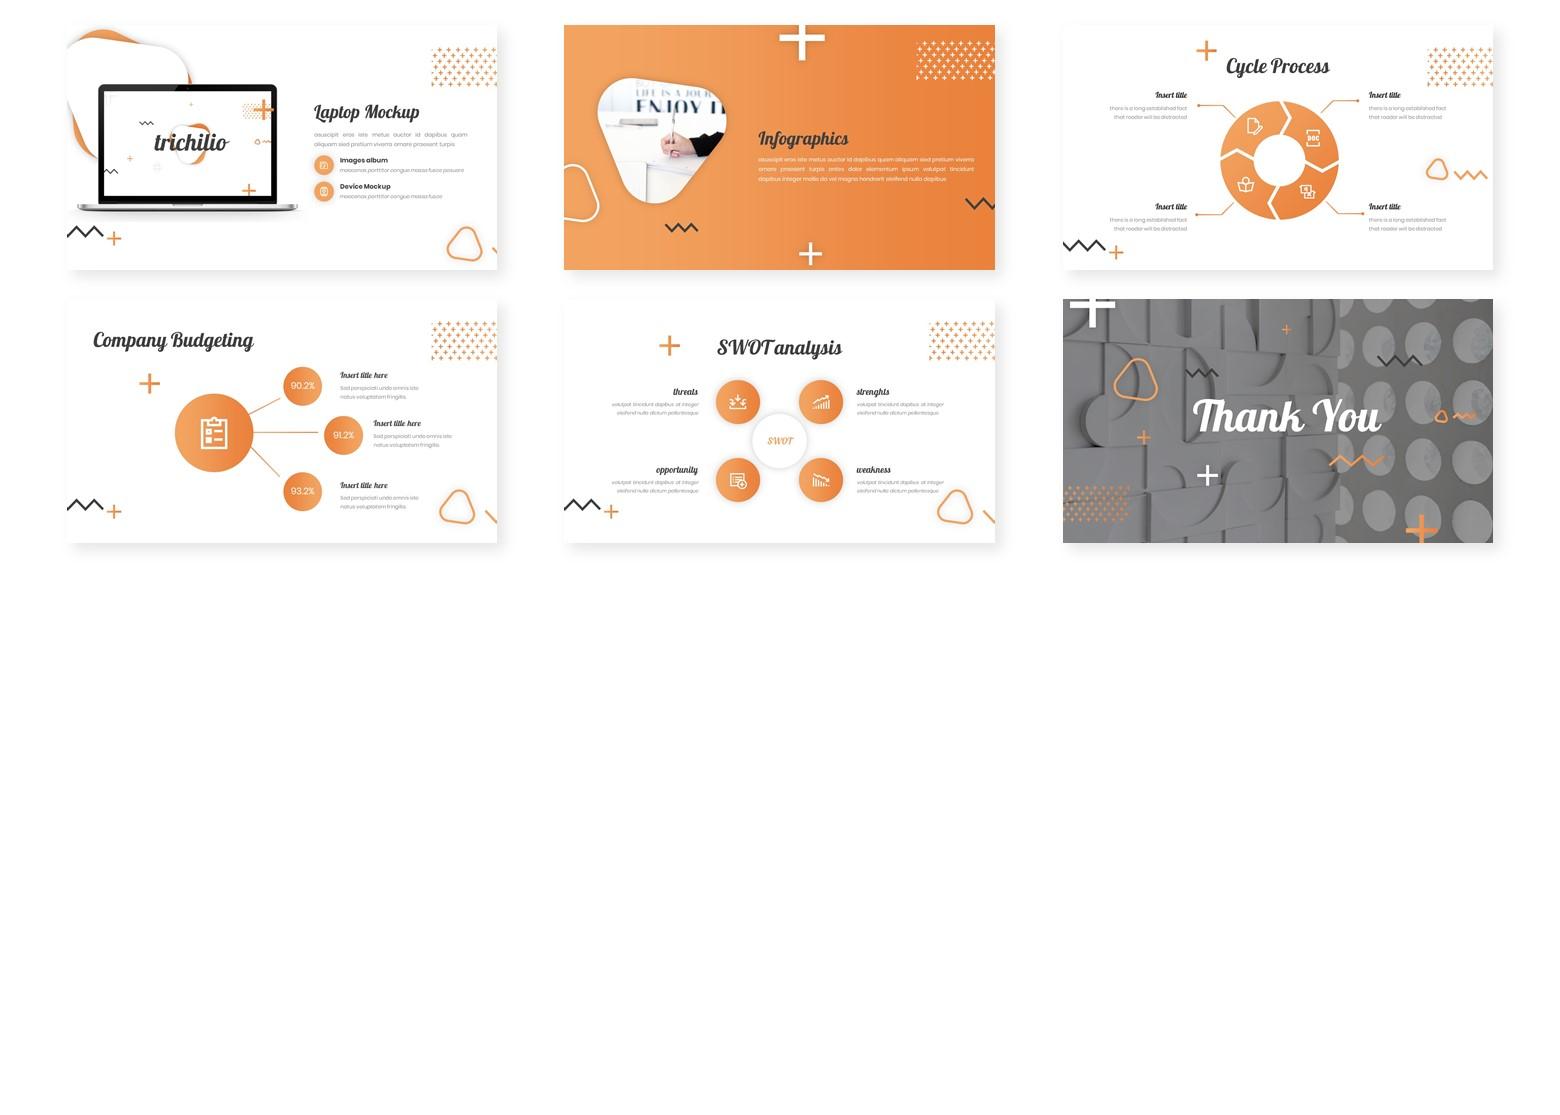 Trichilio PowerPoint Template